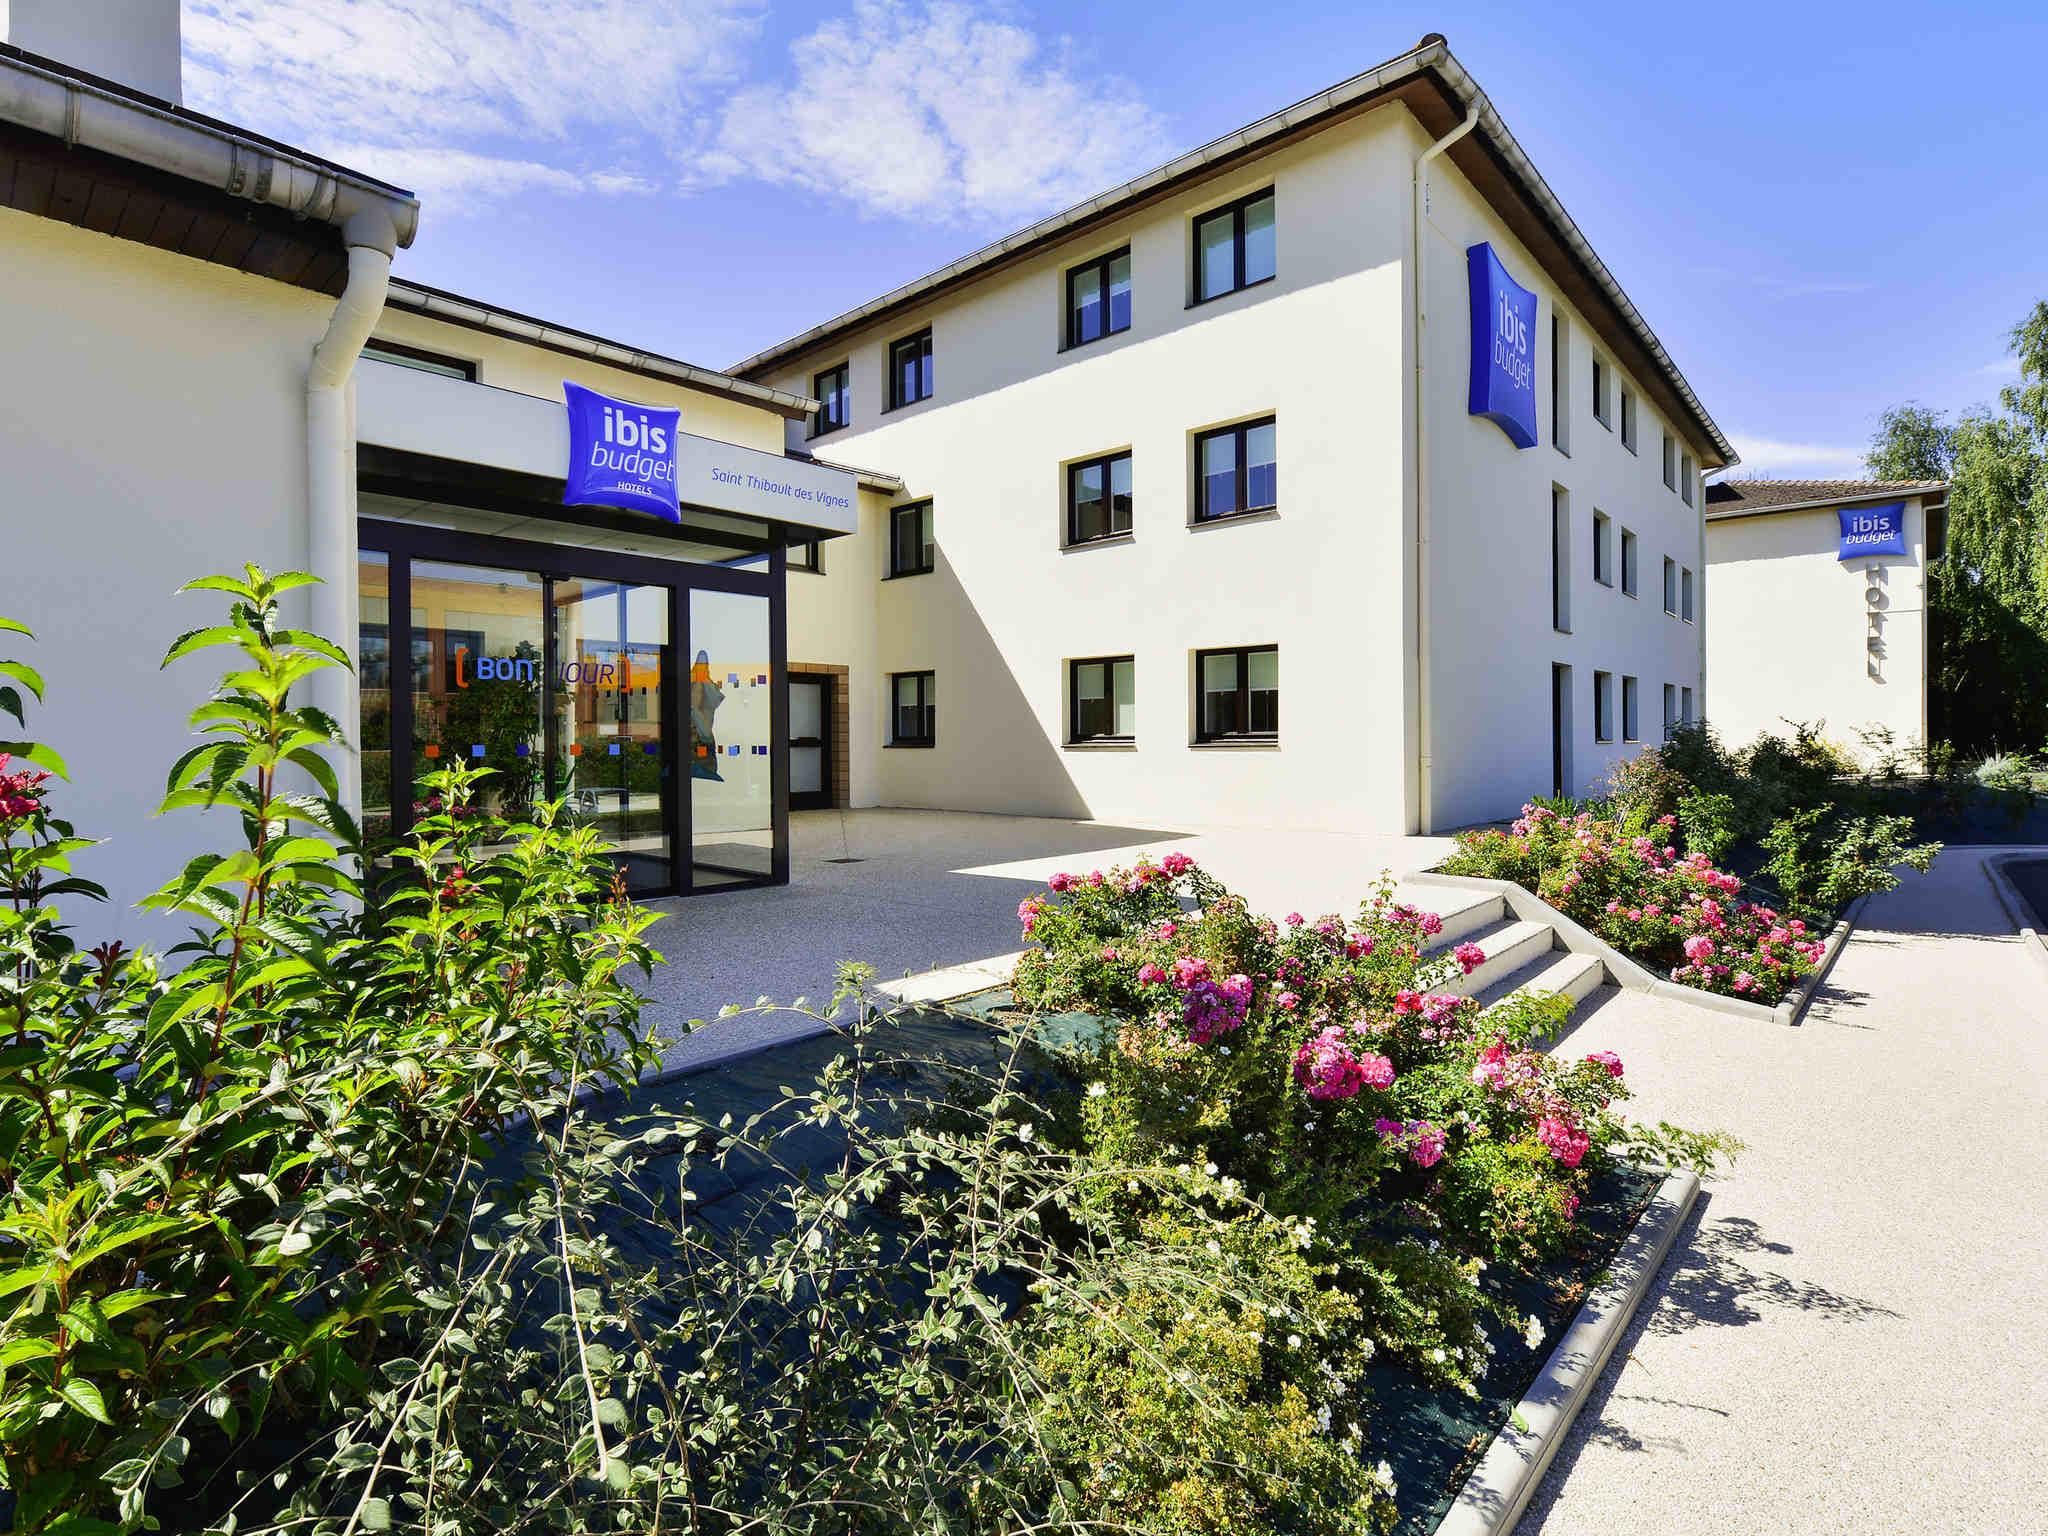 Hotel – ibis budget Marne-la-Vallée